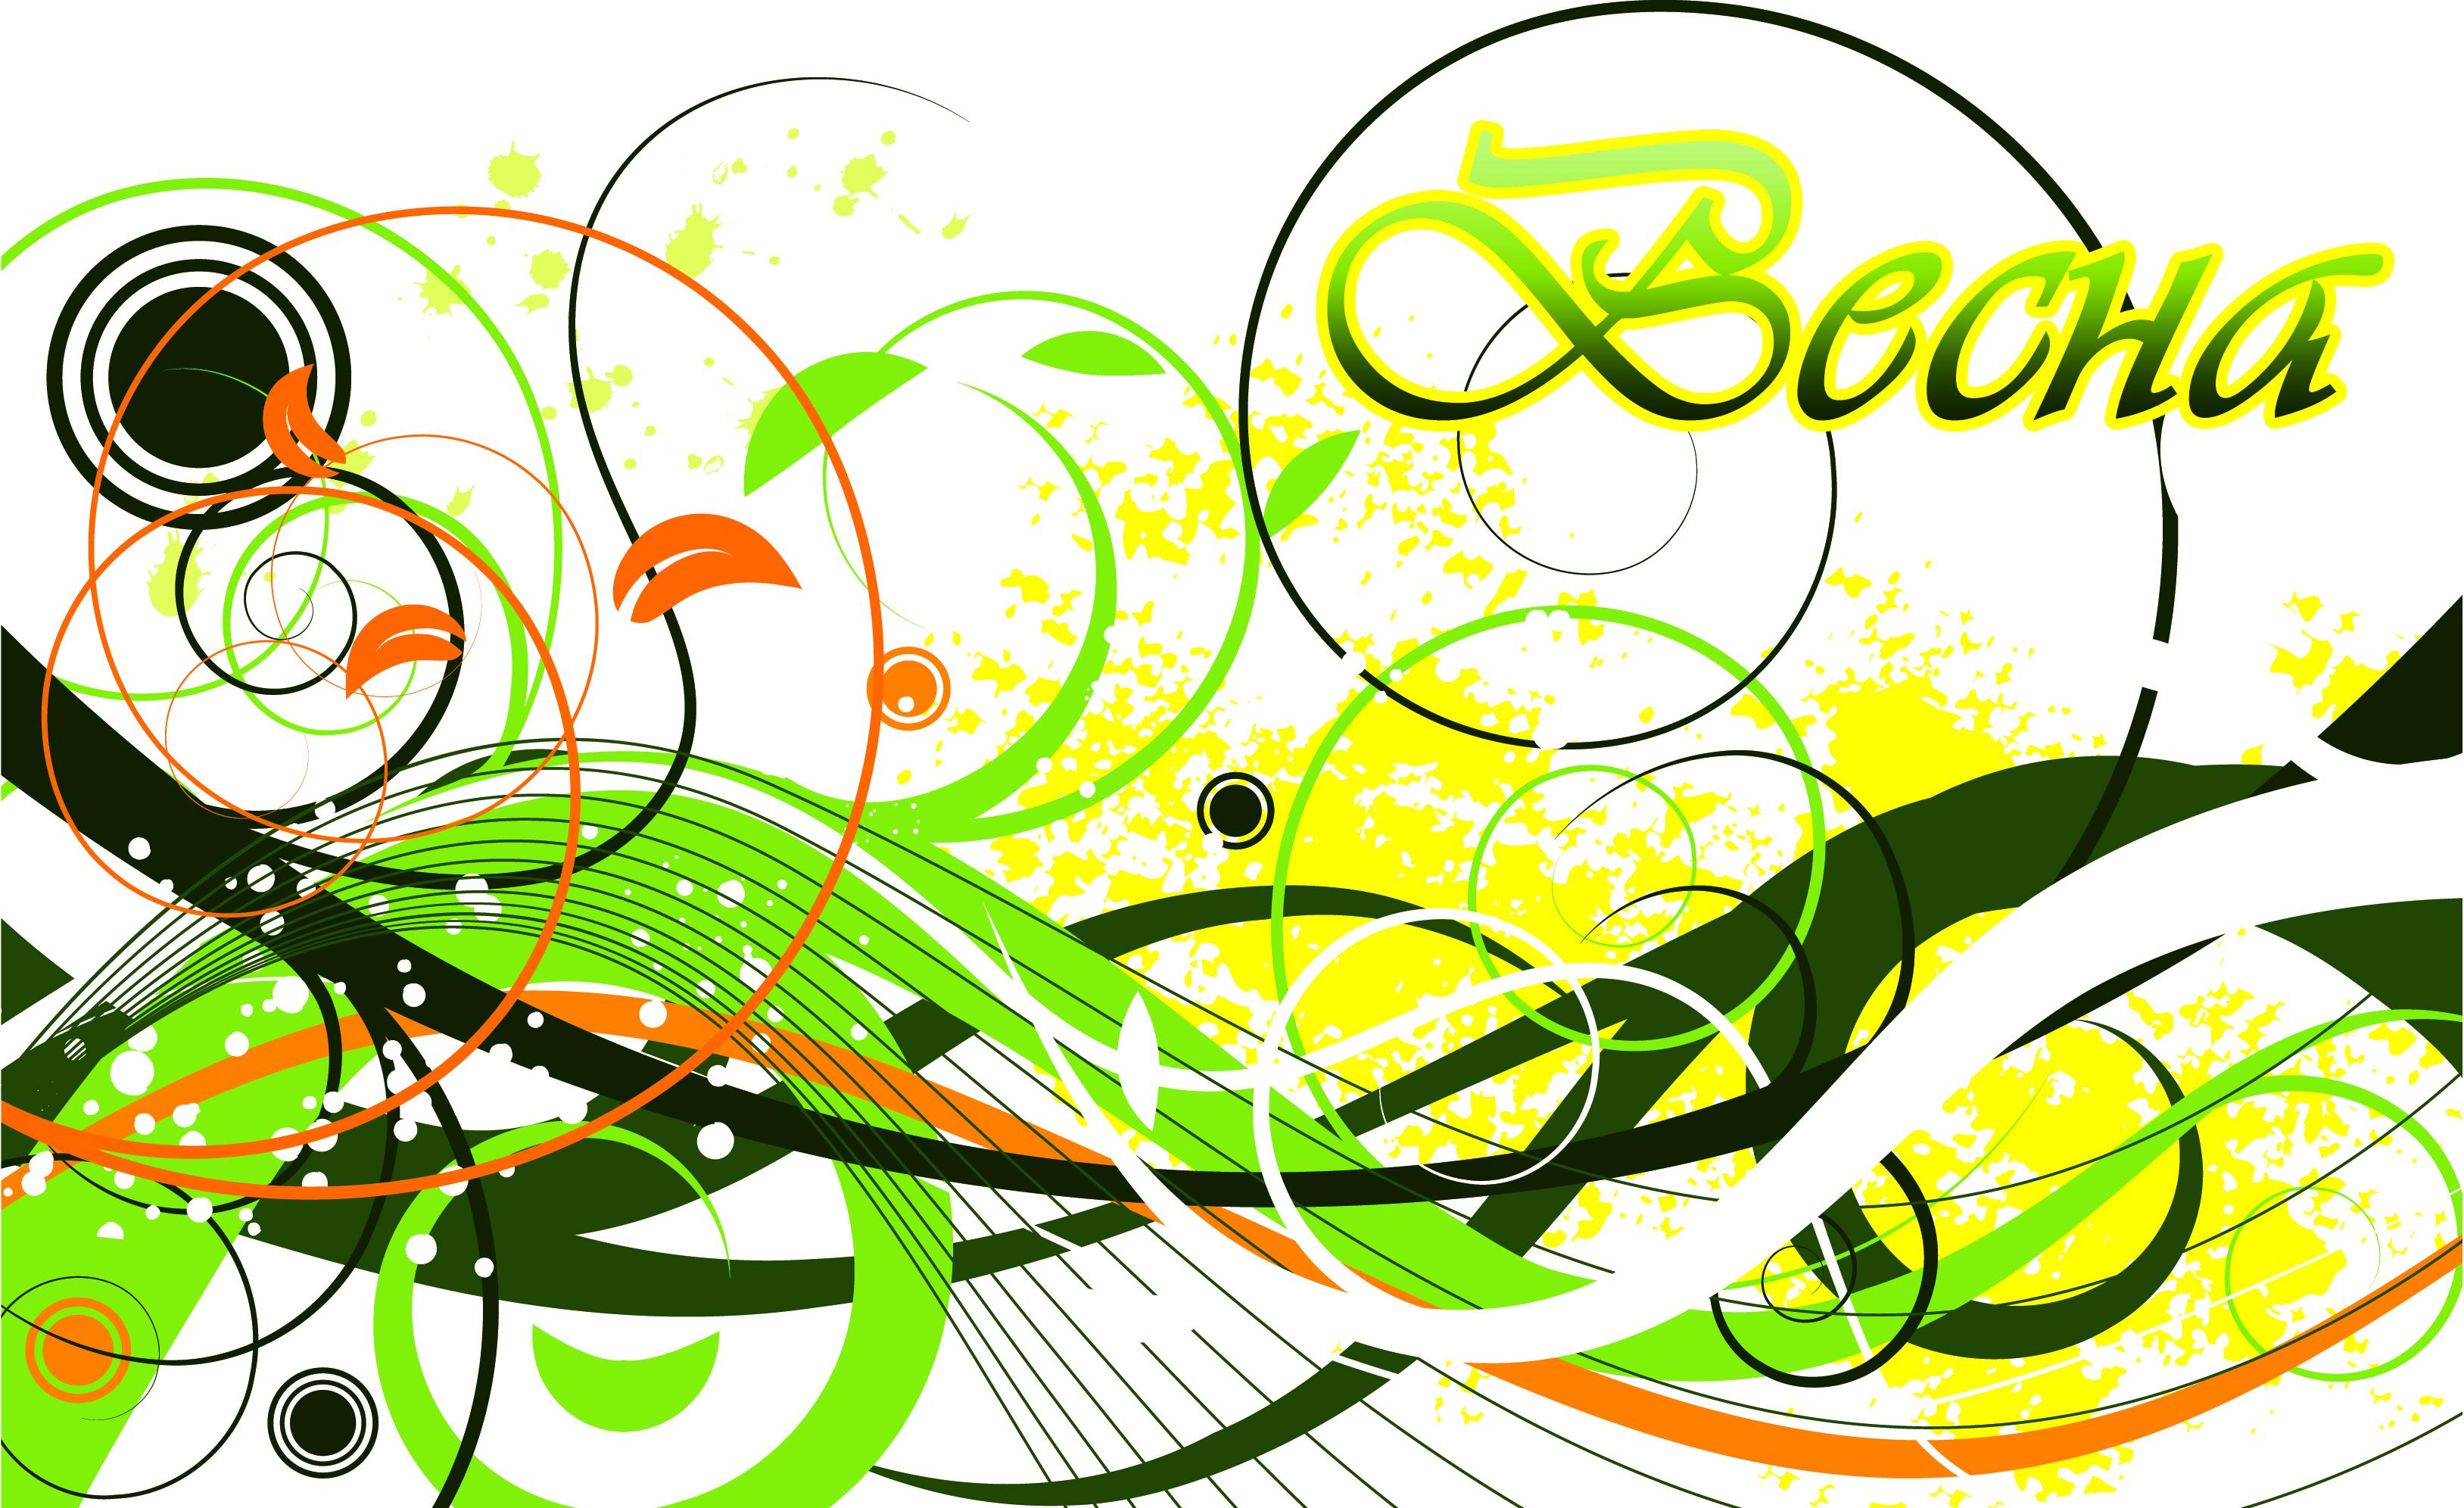 C:\Users\Irishka\Desktop\СЕМИНАРЫ\18 апреля областной семинар\весна\весна 1.jpg